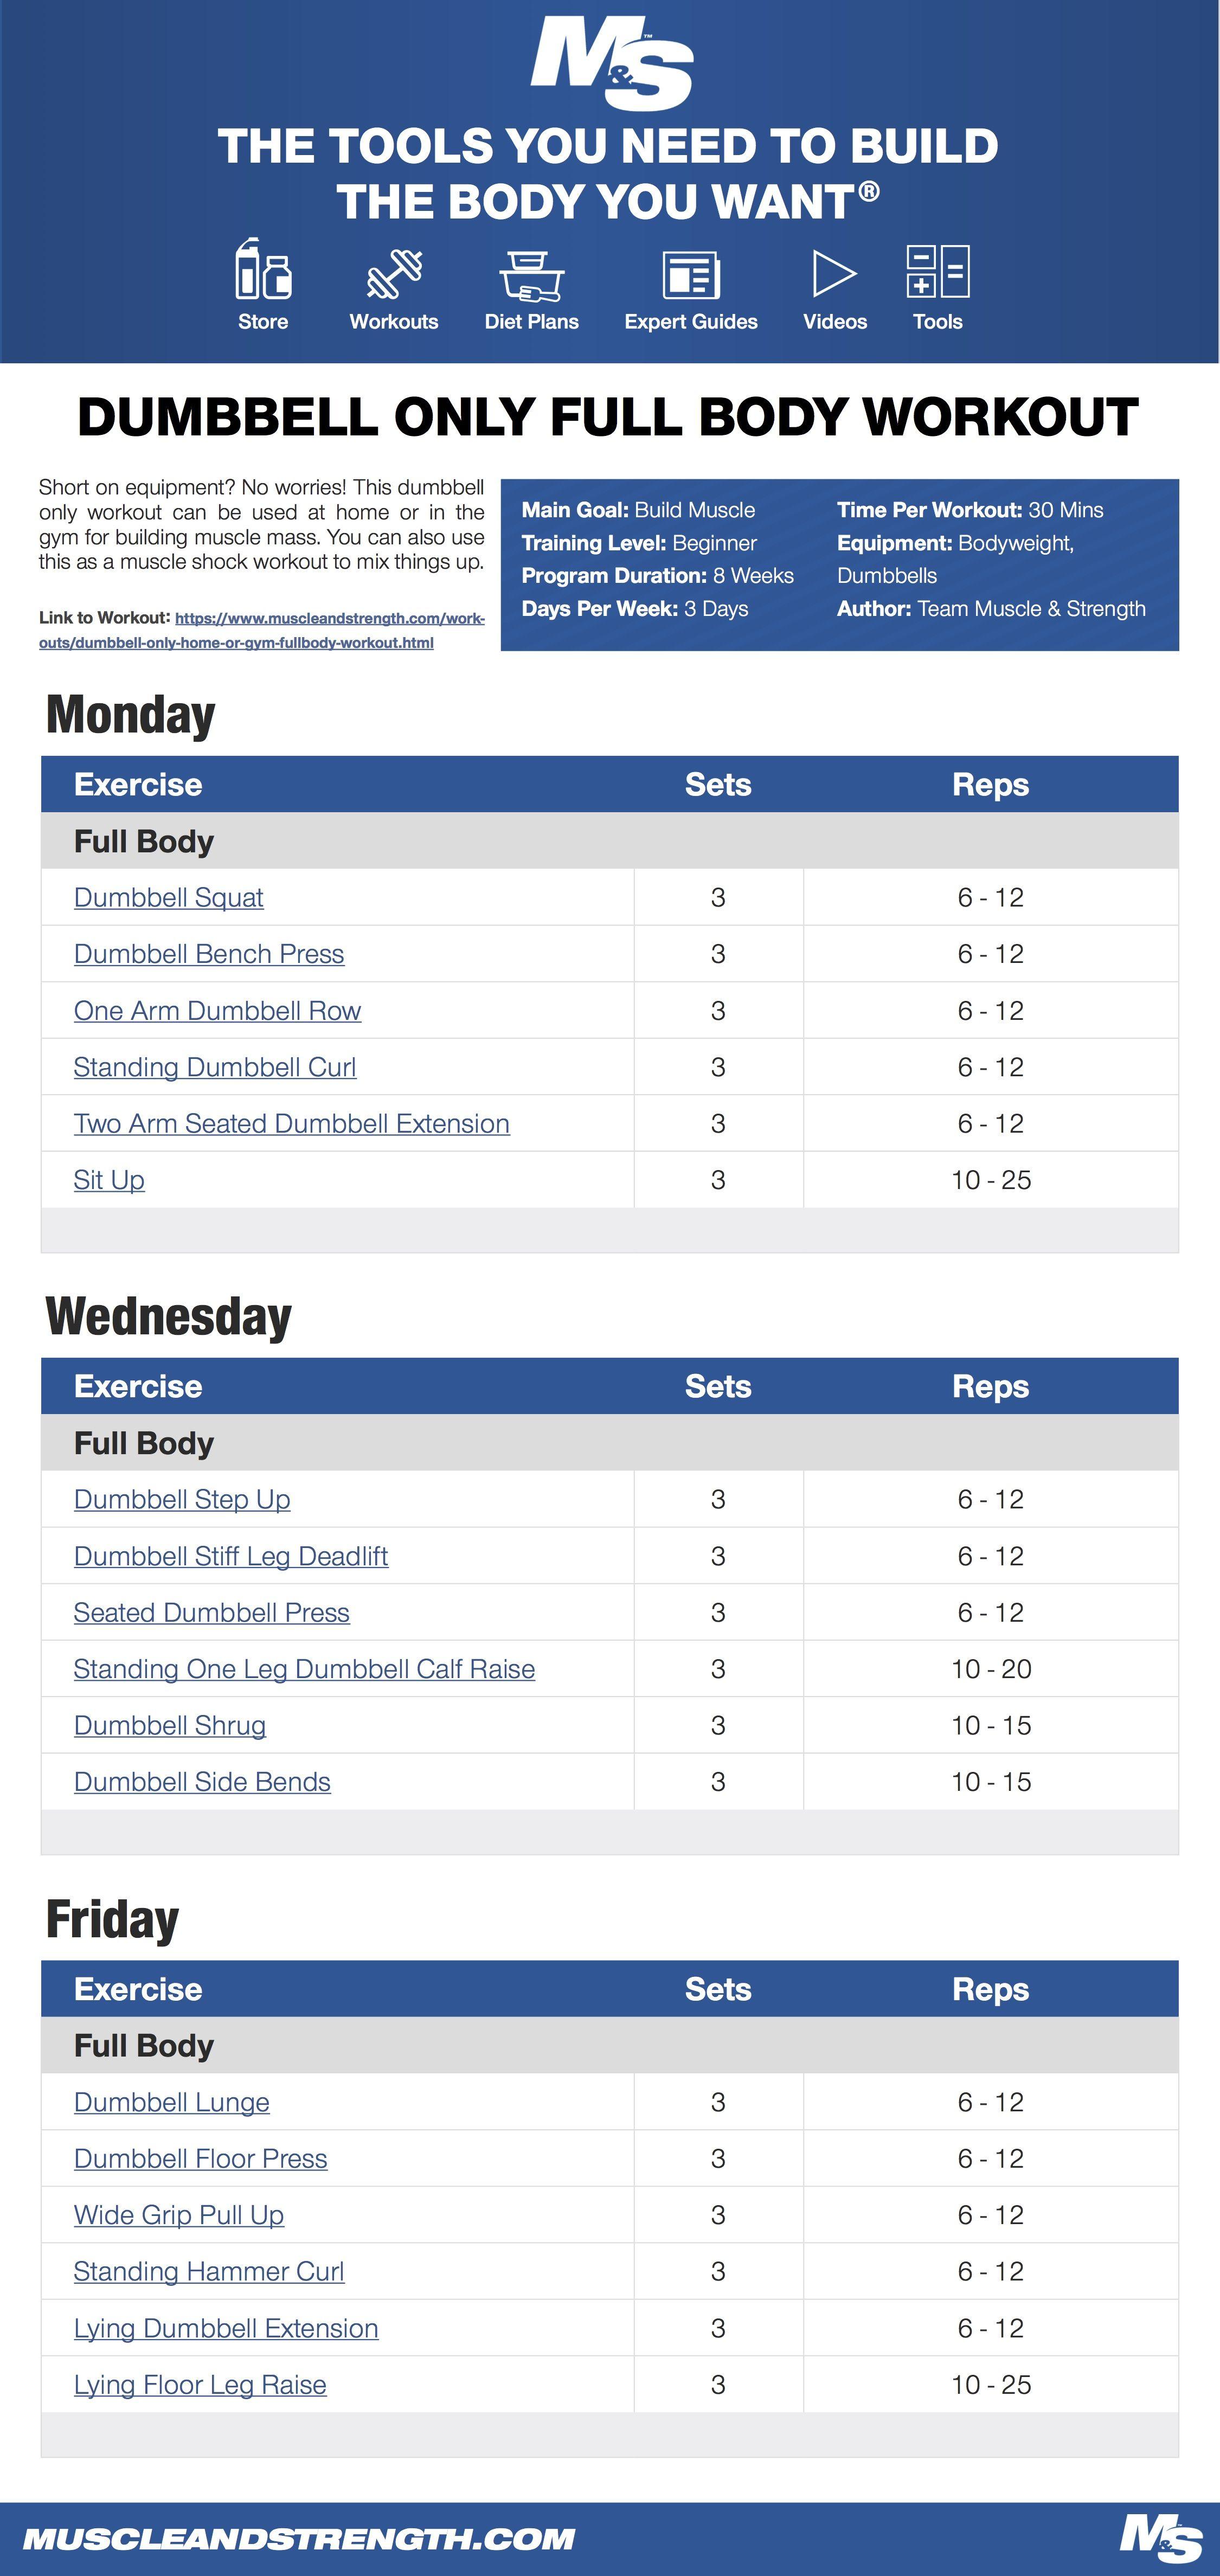 Dumbbell Workout Plan Pdf : dumbbell, workout, Dumbbell, Workout, Workout,, Weekly